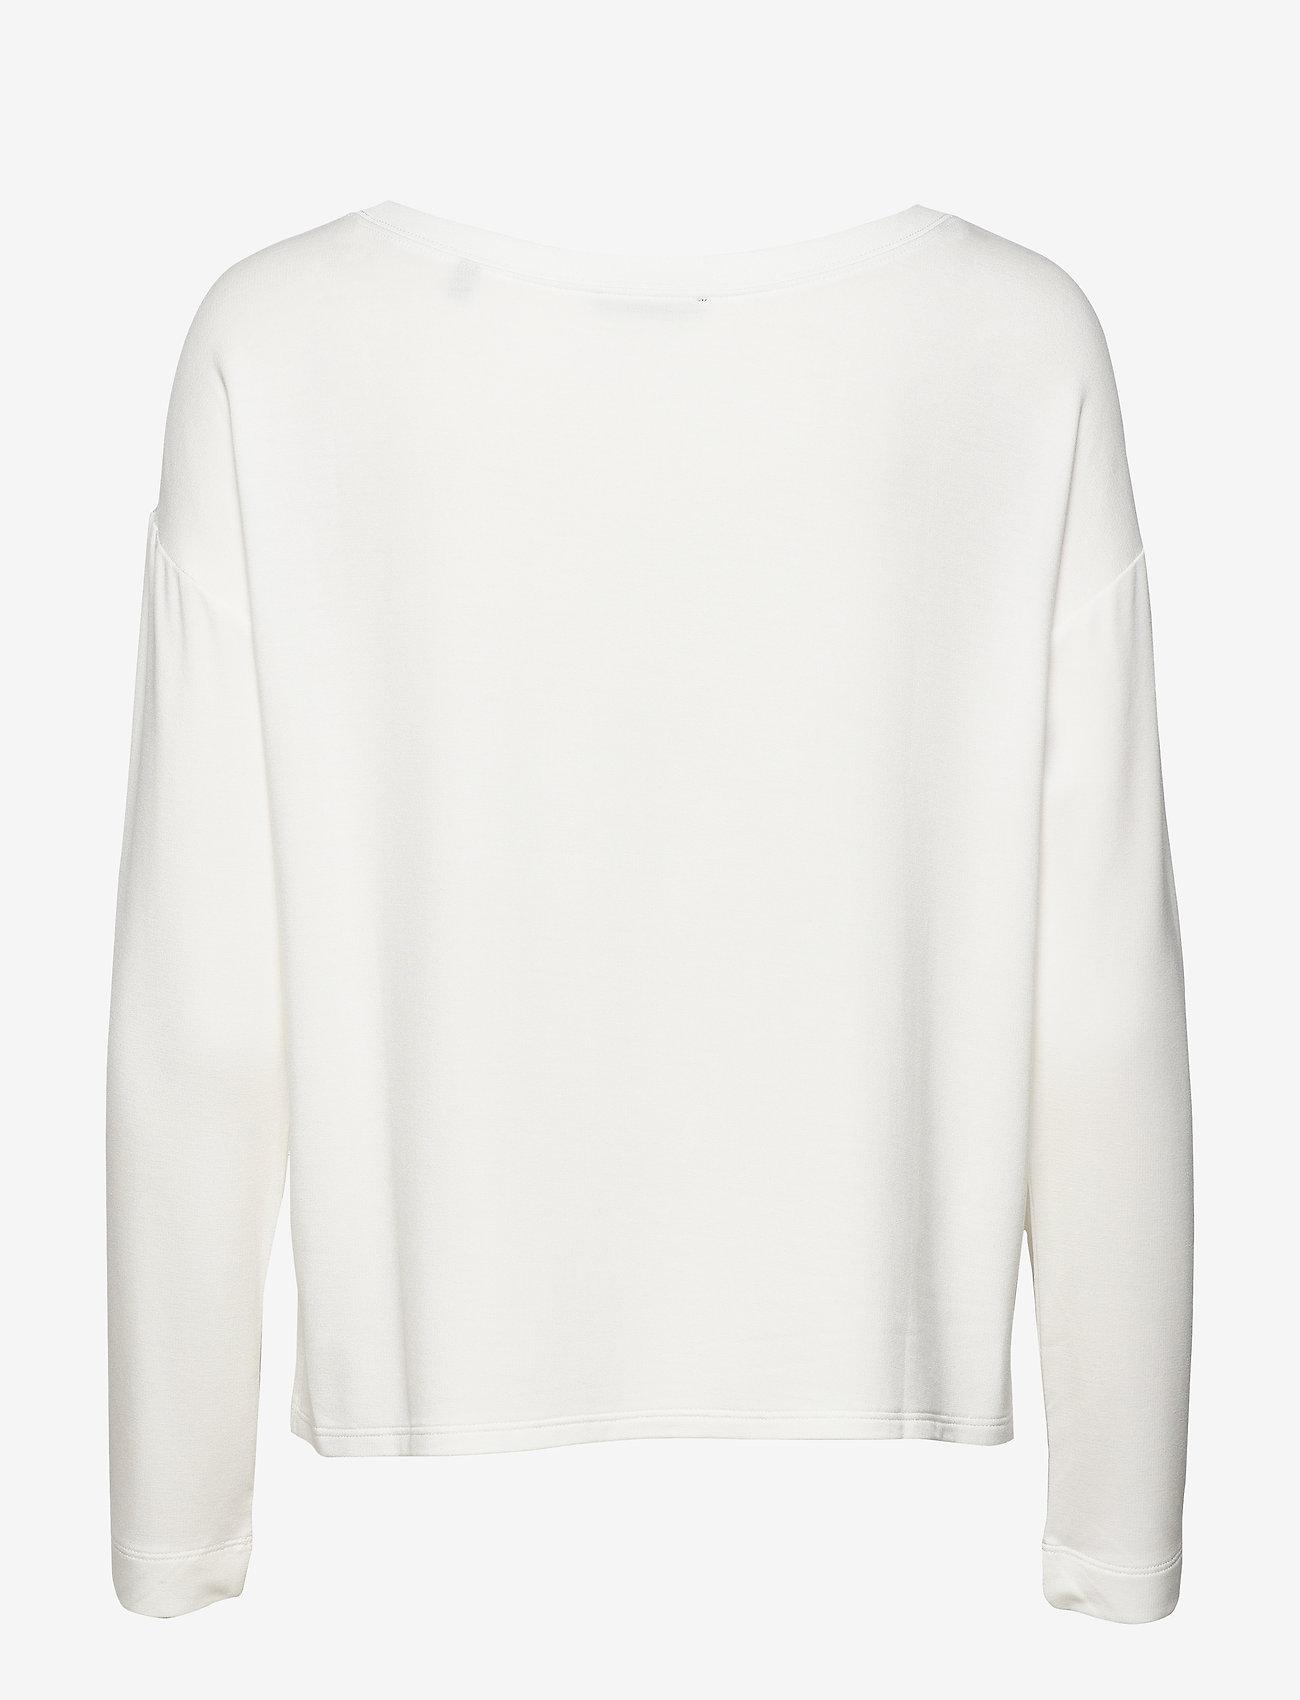 Marc O'Polo - SWEATSHIRTS - sweatshirts - oyster white - 1